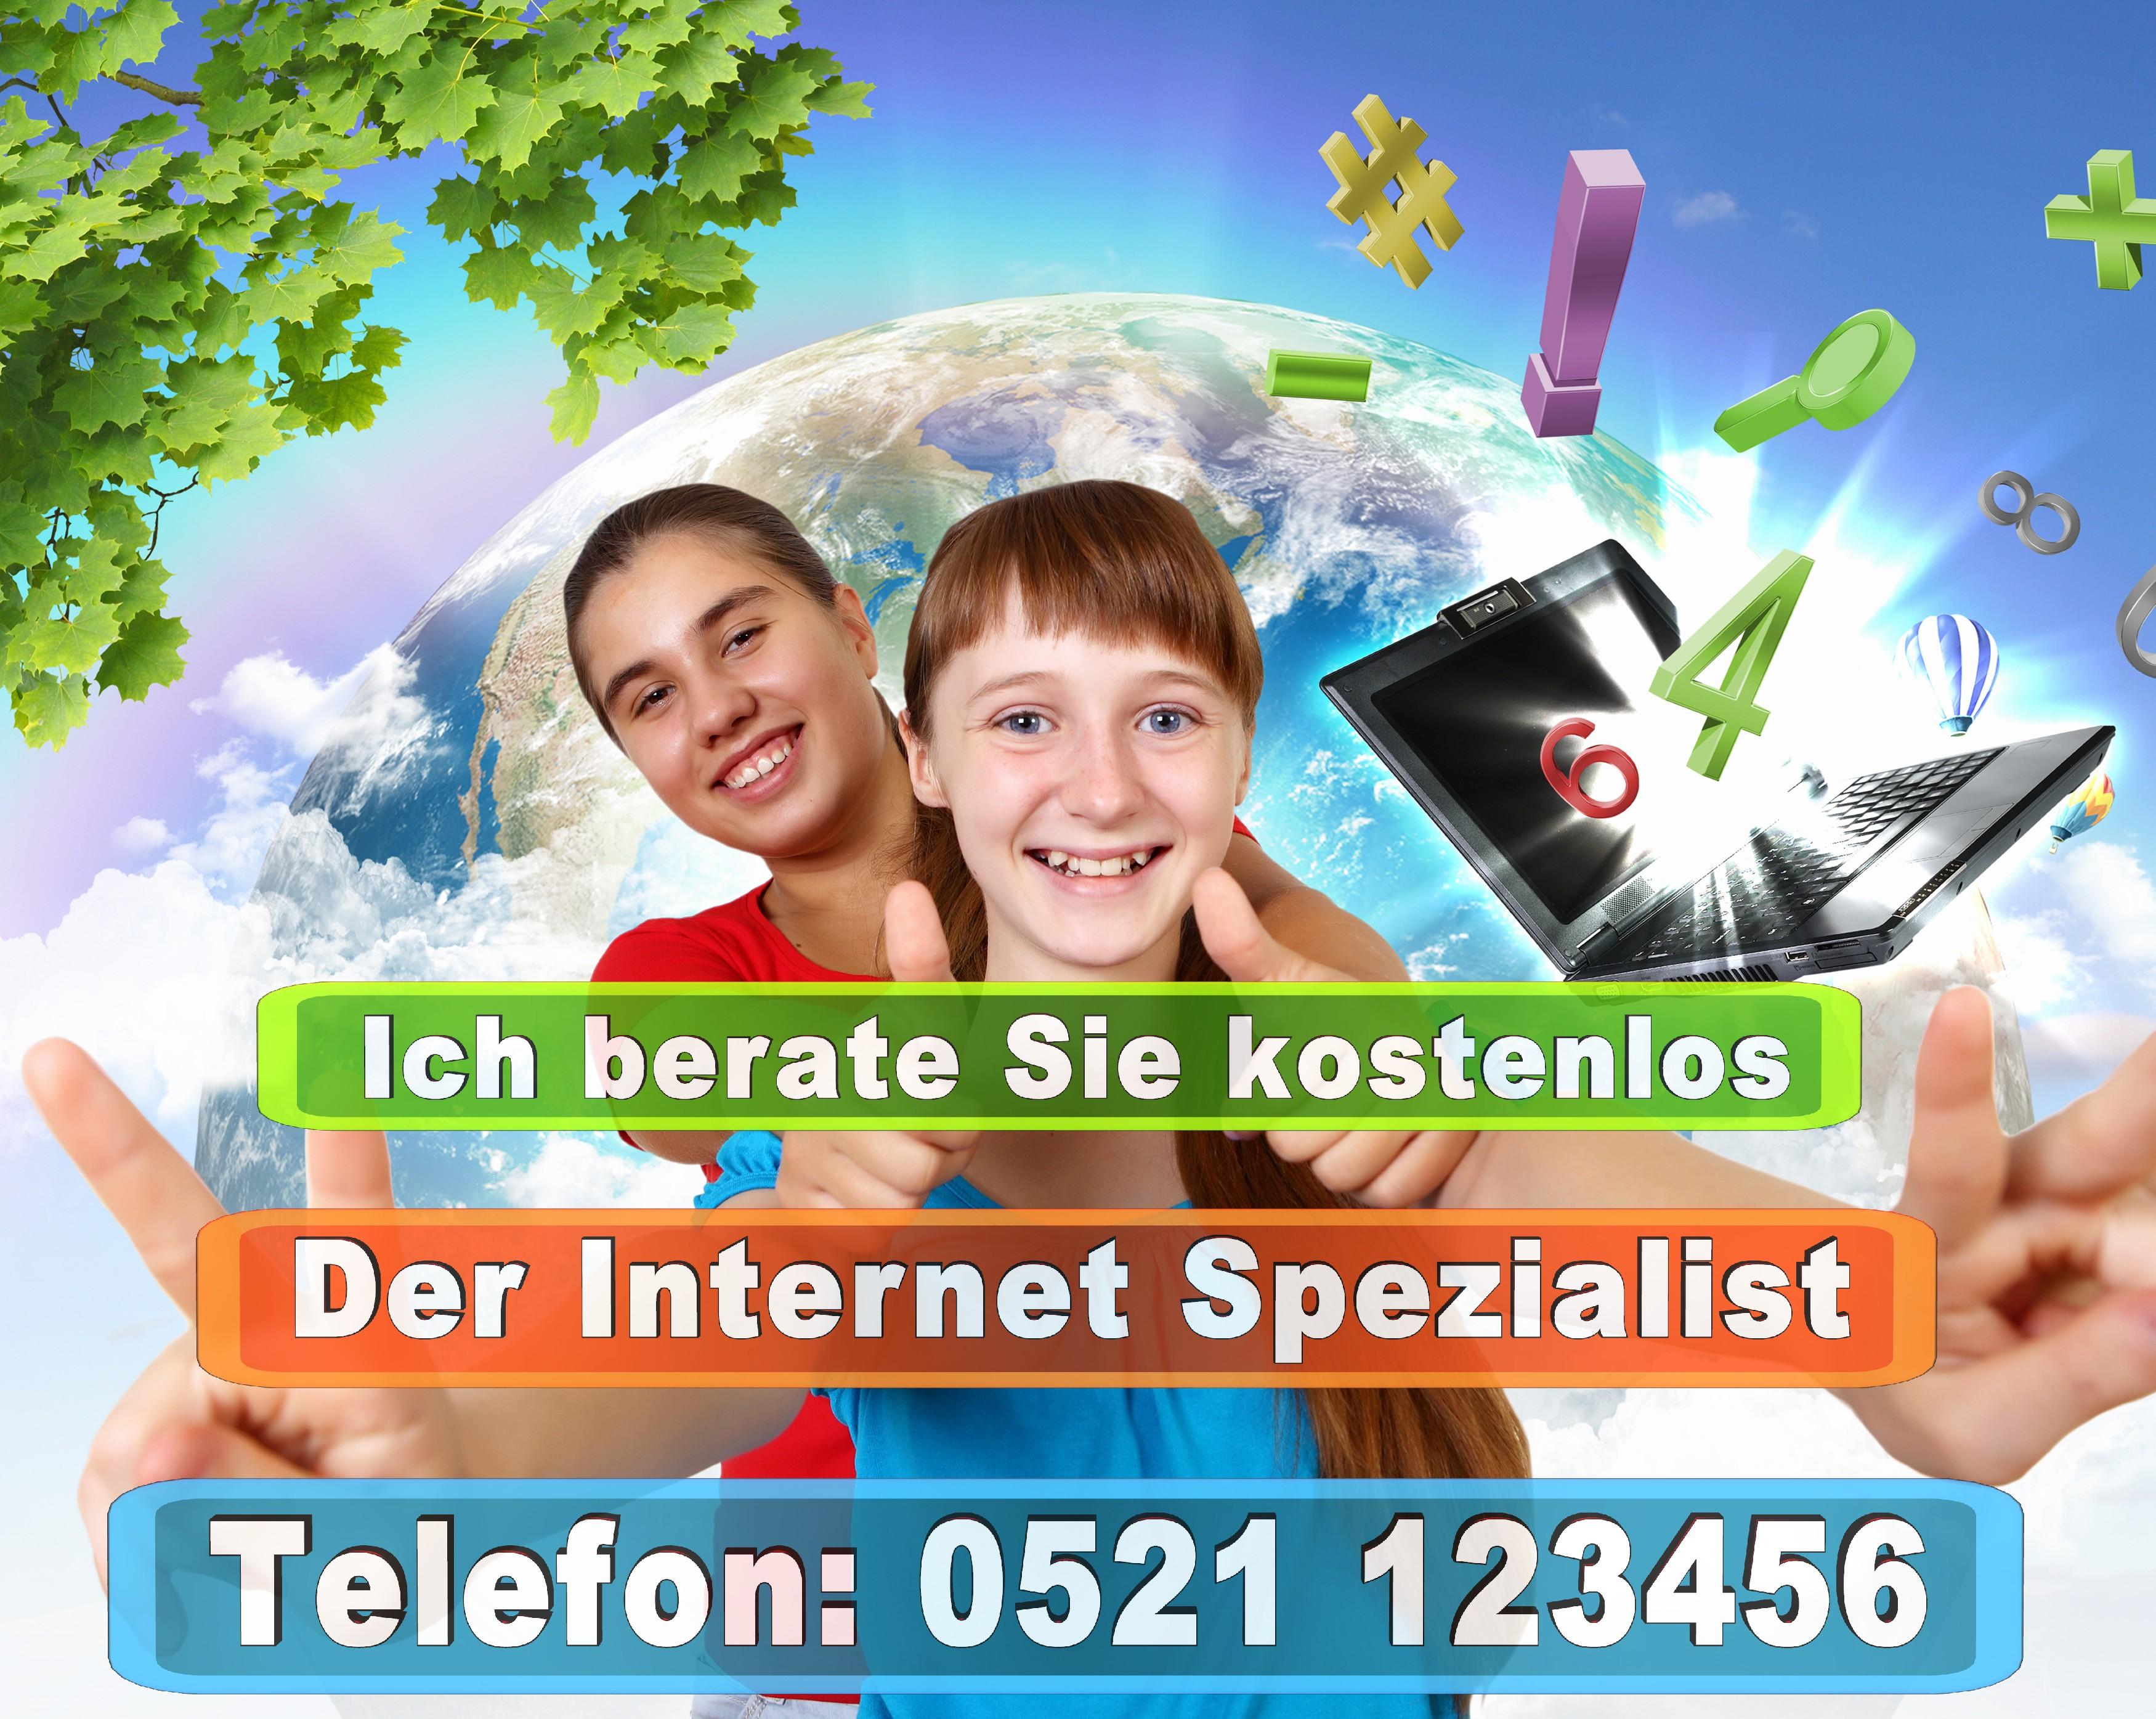 Schulen Bielefeld Schule Grundschule Sonderschule Hauptschule Realschule Schulhof Turnhalle Sporthalle Bielefeld NRW (6)